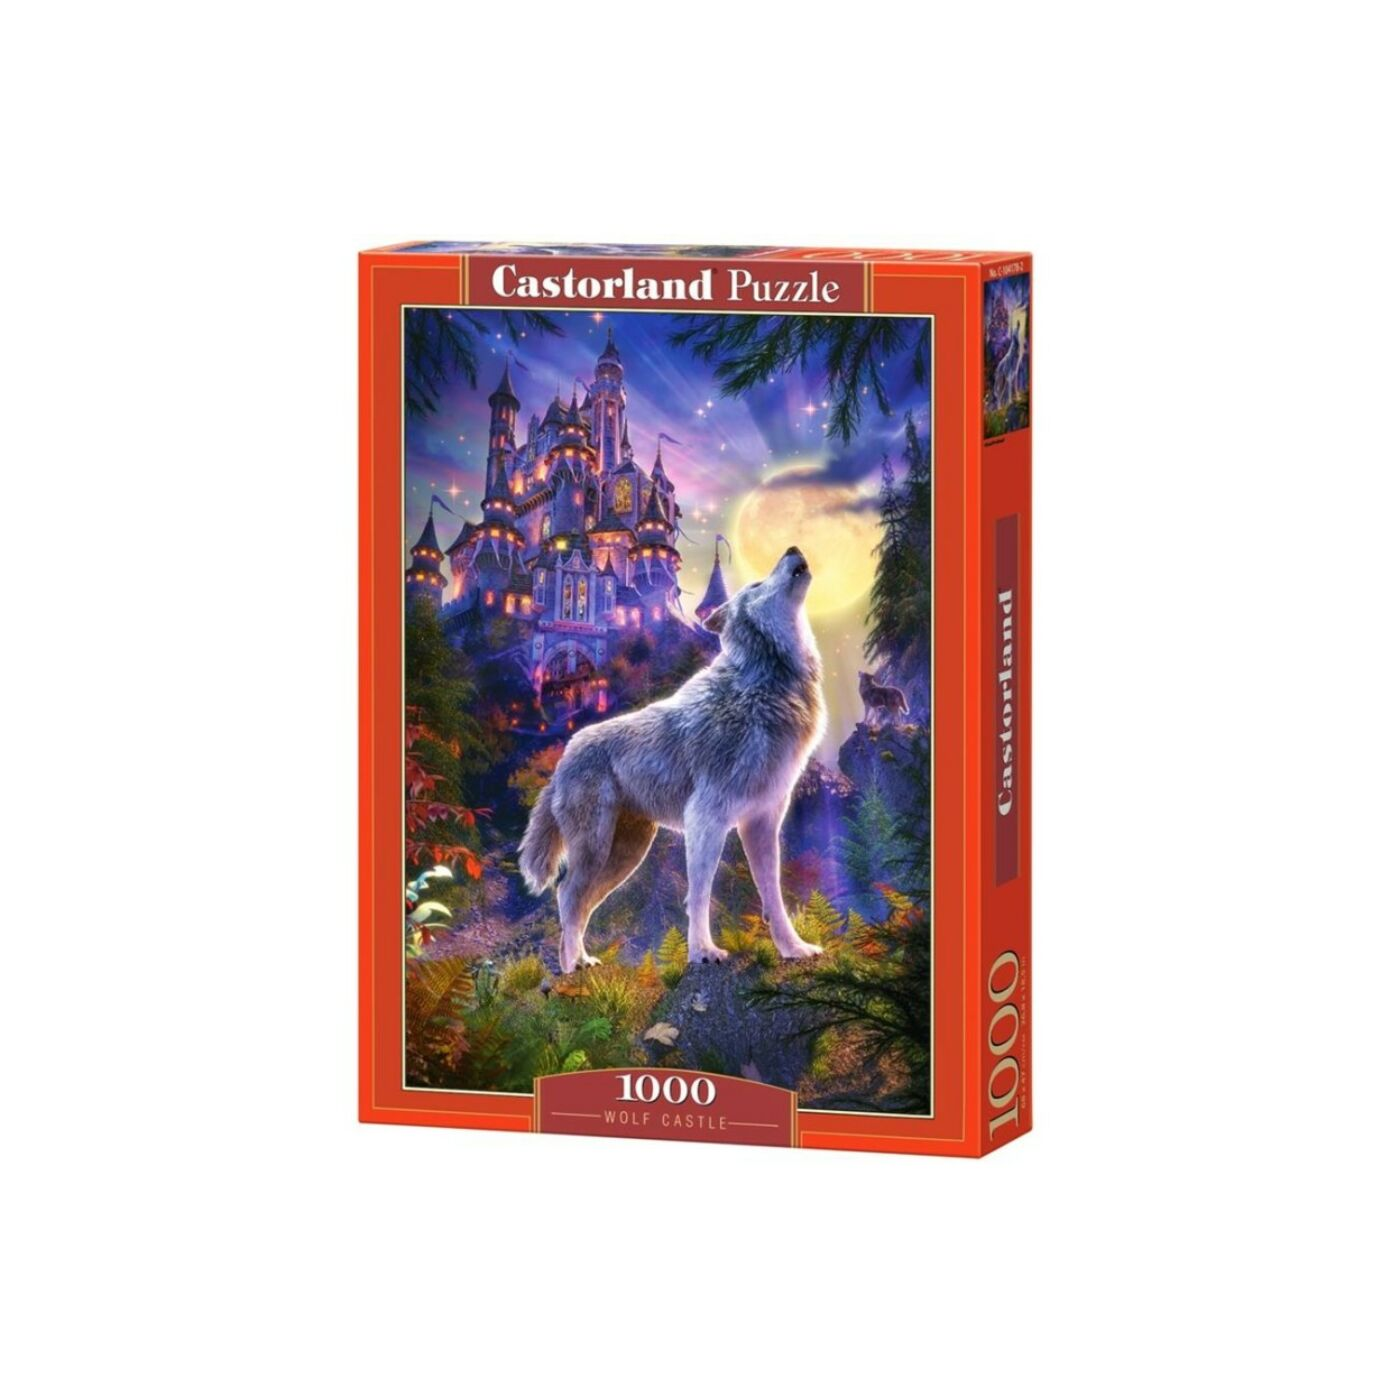 1000 db-os Castorland Puzzle - Farkas kastély